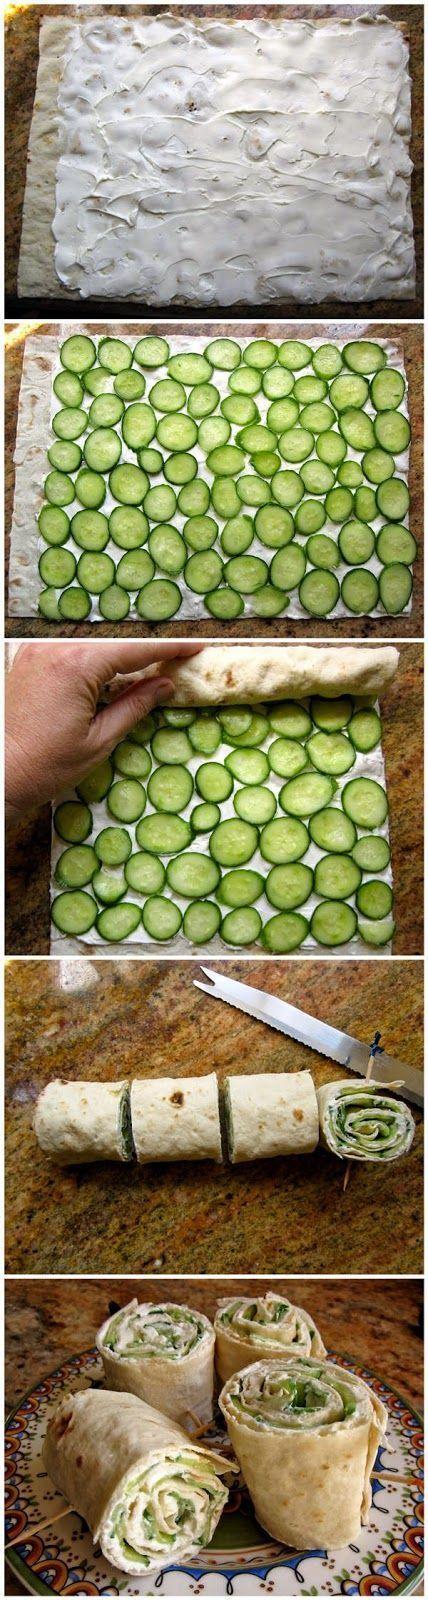 Cucumber and Cream Cheese Sandwich Rolls: